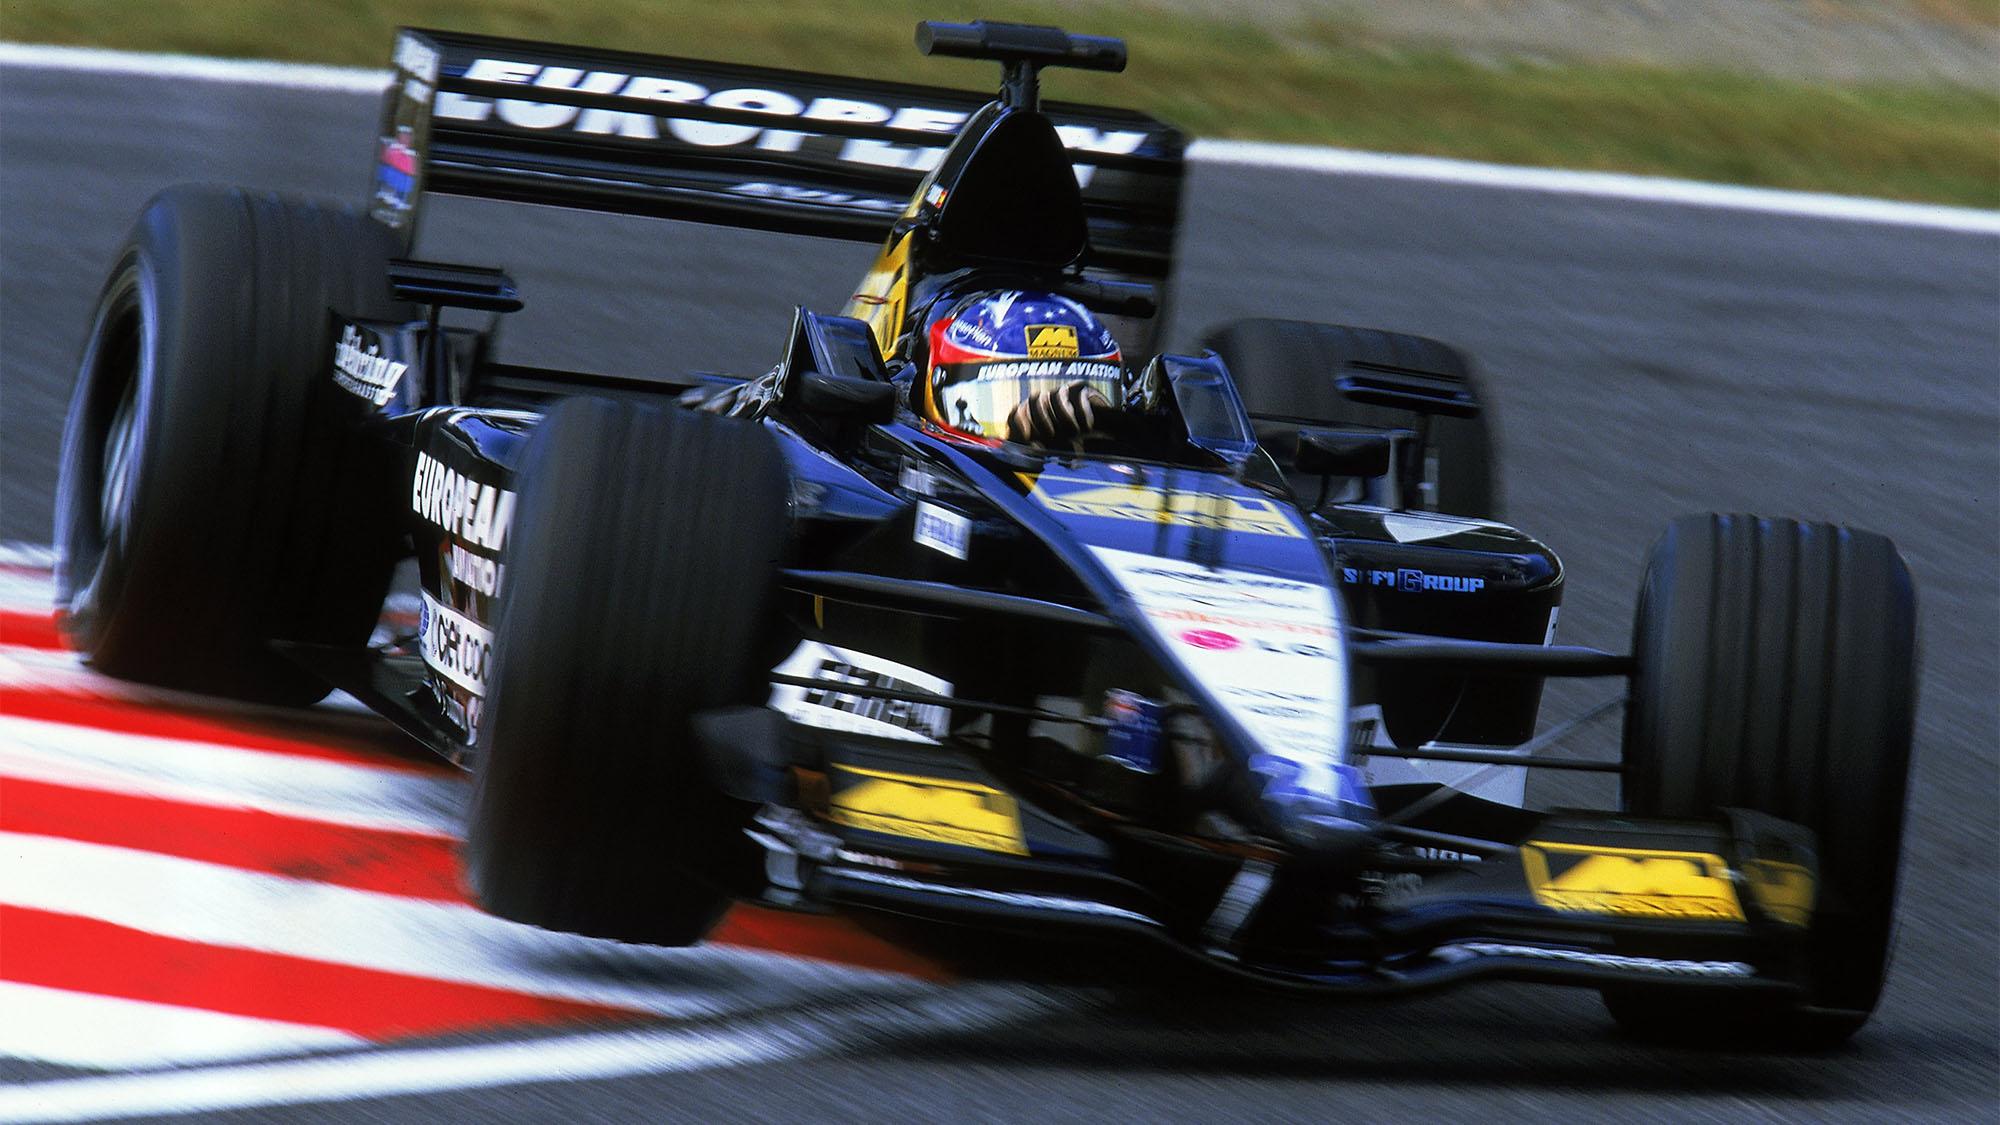 14 Oct 2001: Minardi driver Fernando Alonso of Spain puts his car through its paces during the Formula One Japanese Grand Prix held at Suzuka in Suzuka, Japan. \ Mandatory Credit: Clive Mason /Allsport